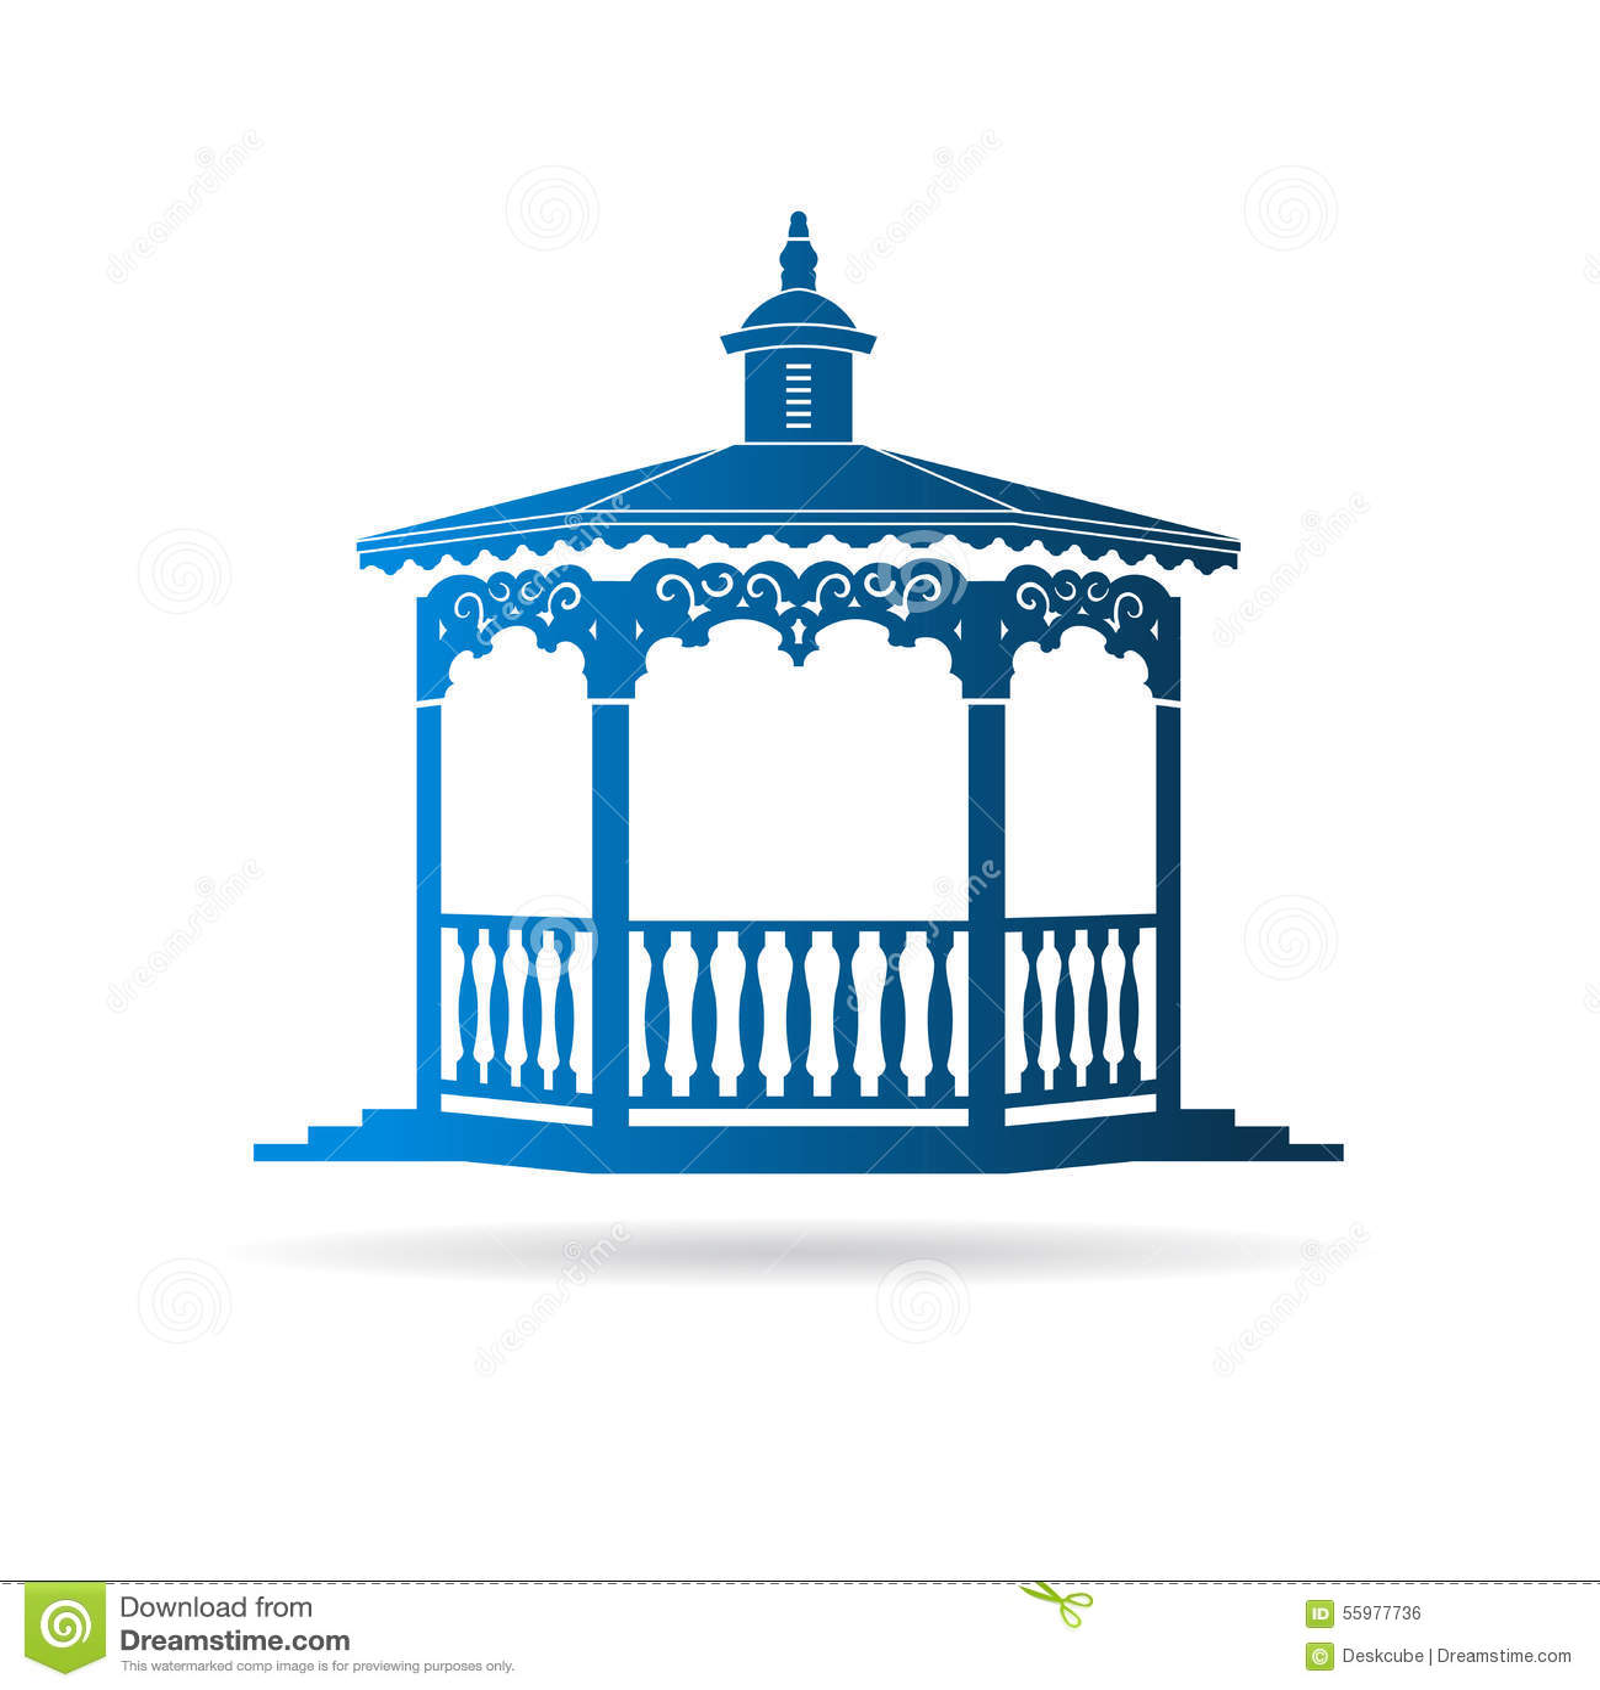 Wedding Gazebo Logo Stock Vector Illustration Of Home 55977736